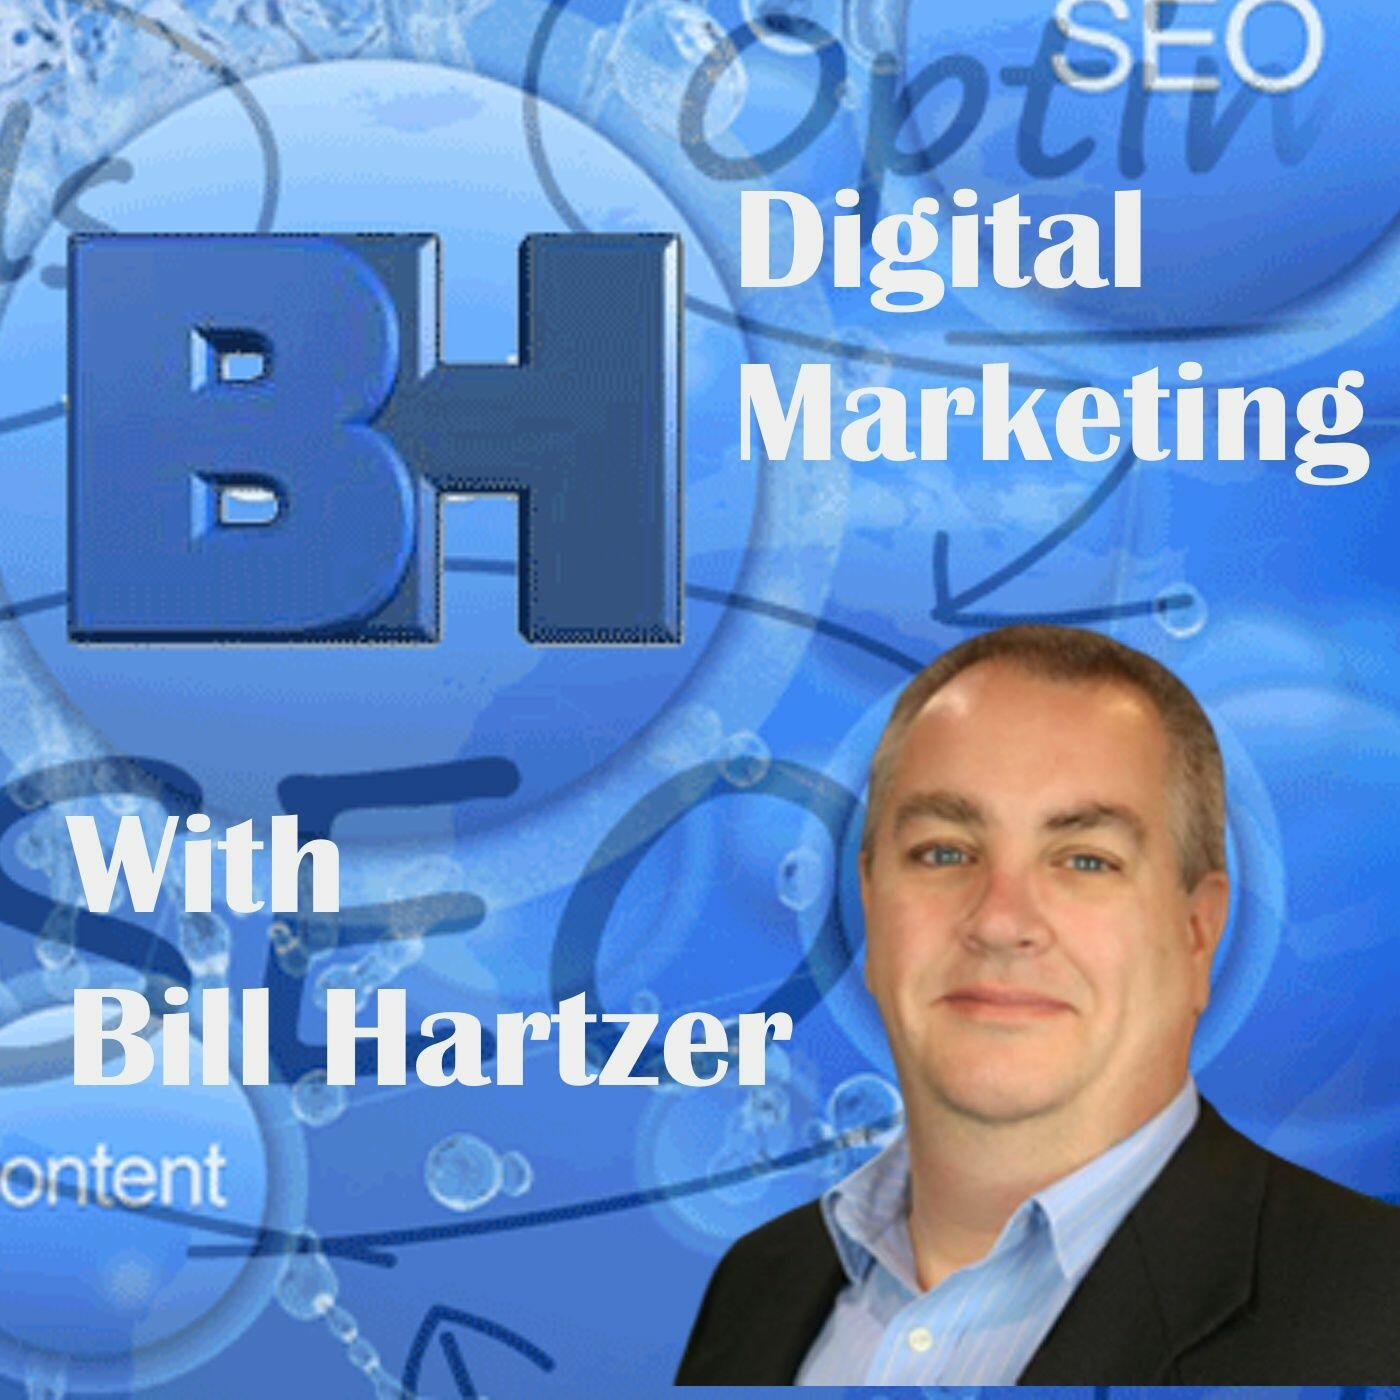 Digital Marketing with Bill Hartzer